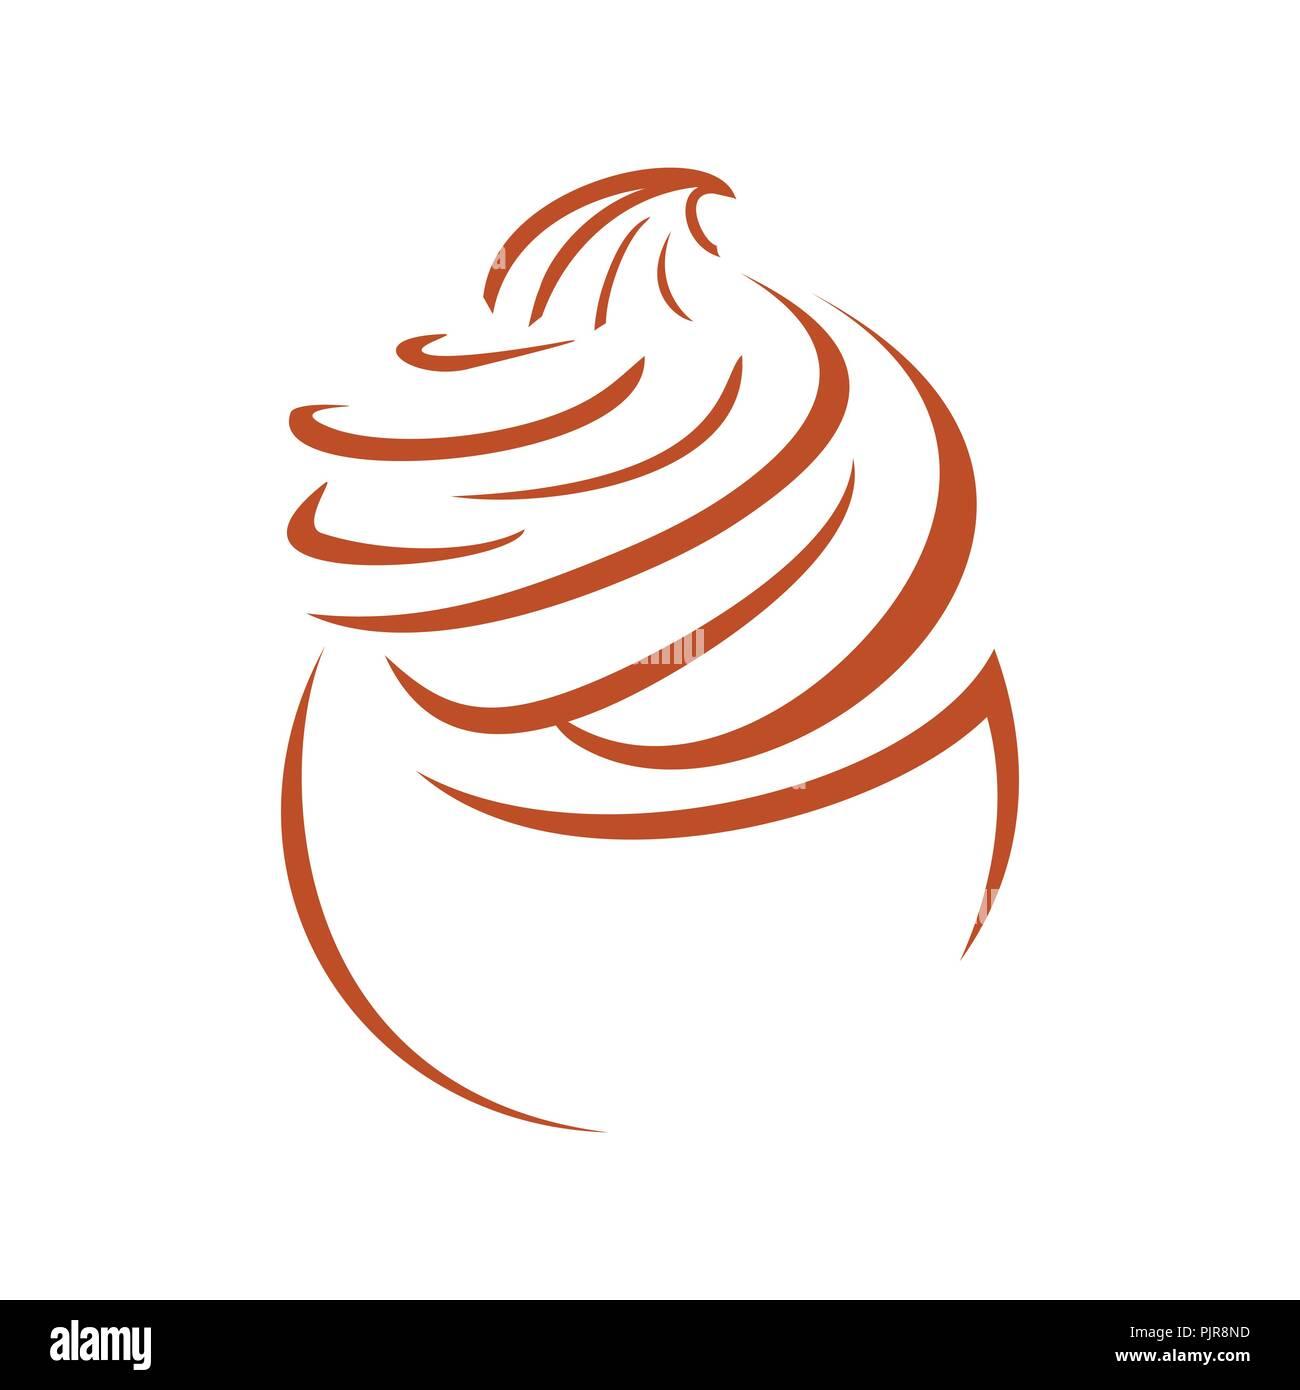 Cupcake Line Art Whip Cream Vector Symbol Graphic Logo Design